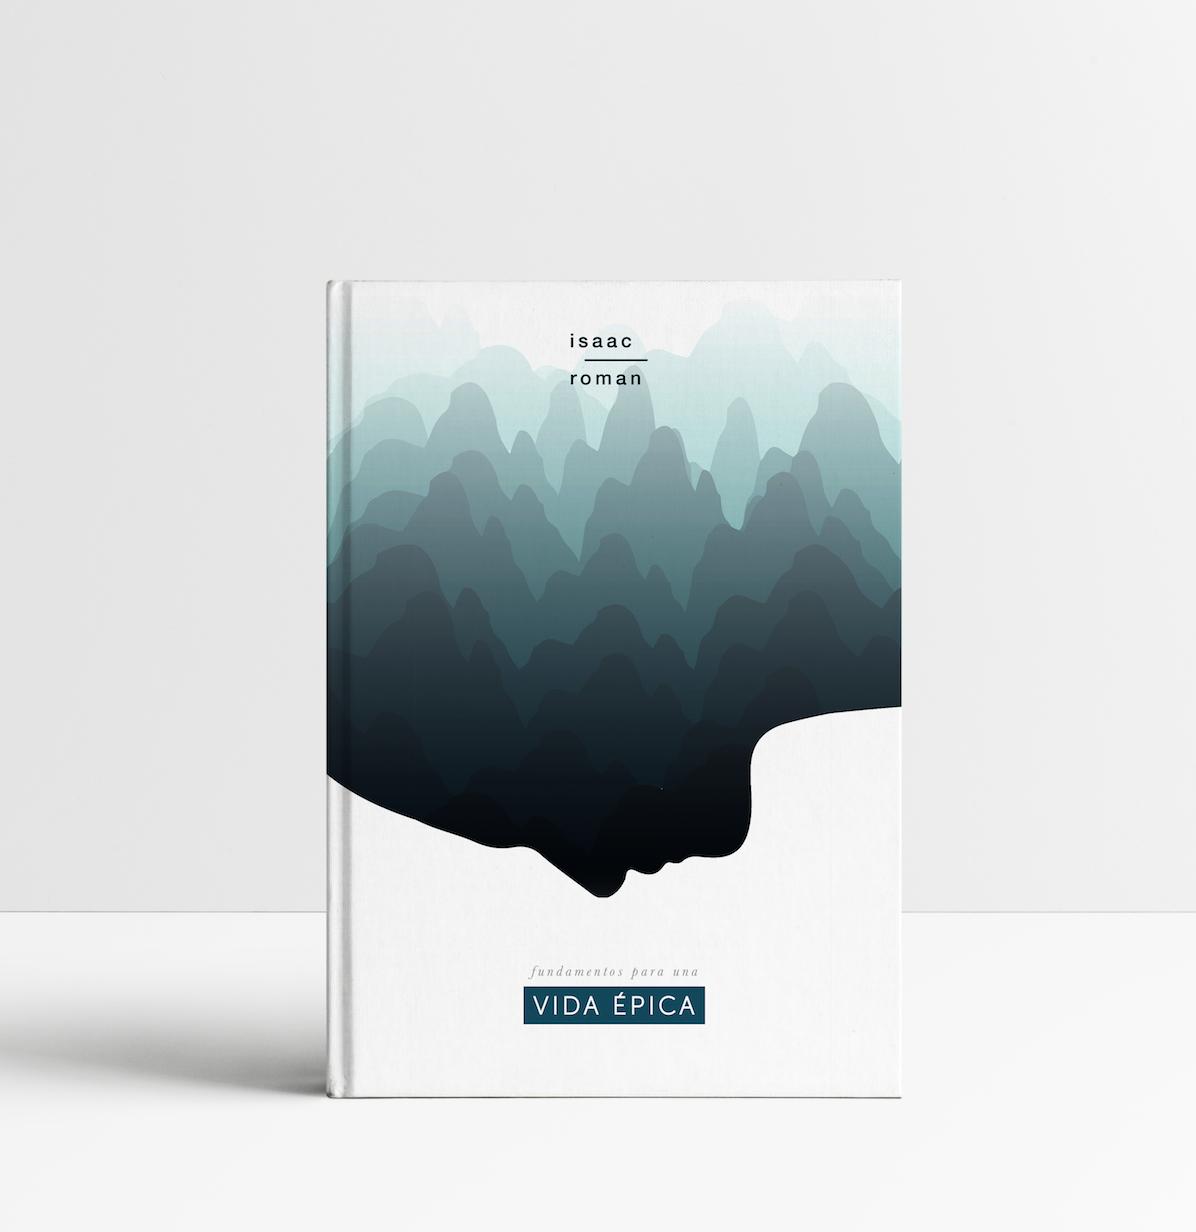 Branding & Book Cover Design